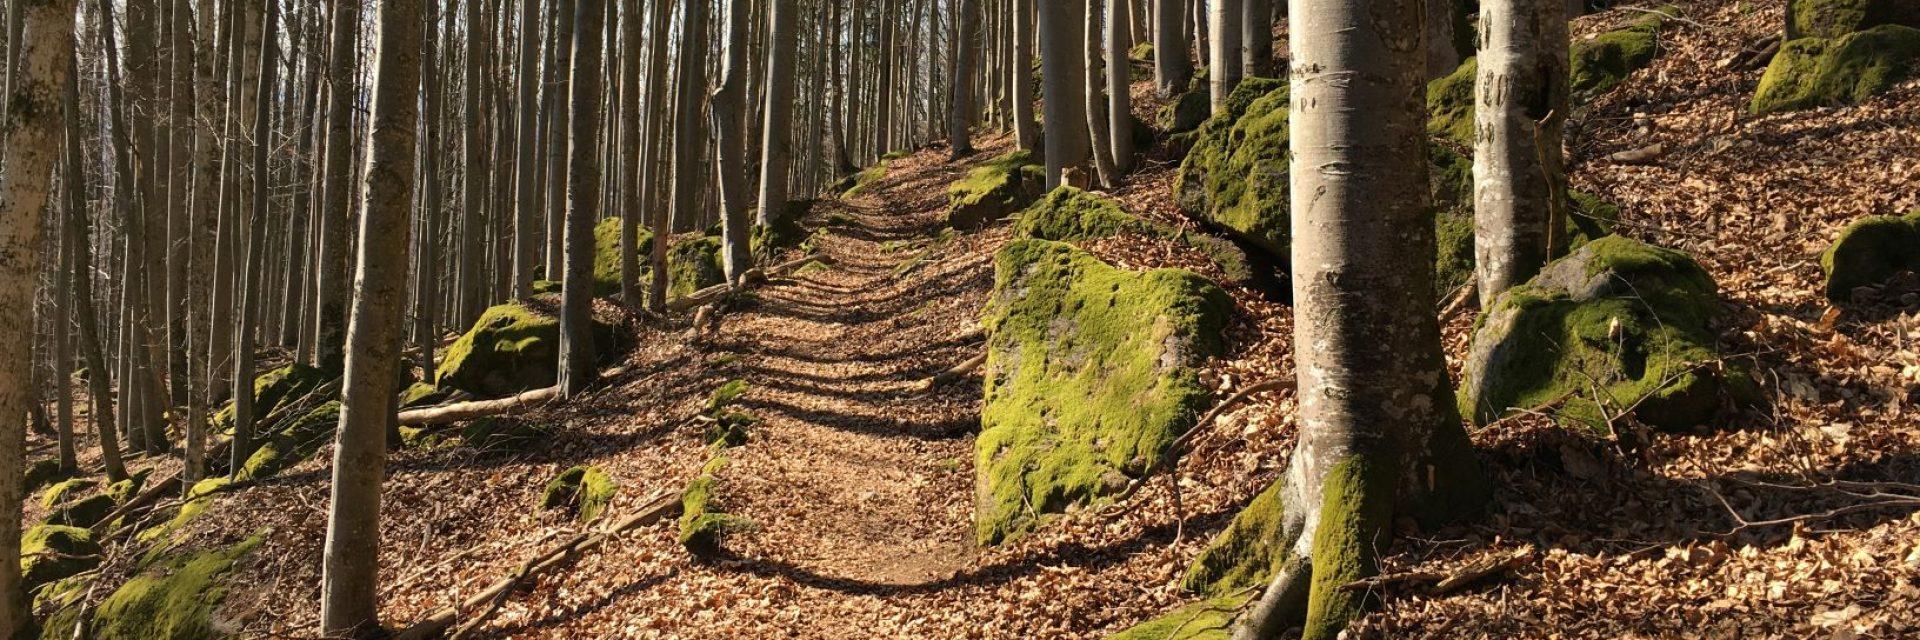 Praxis im Wald